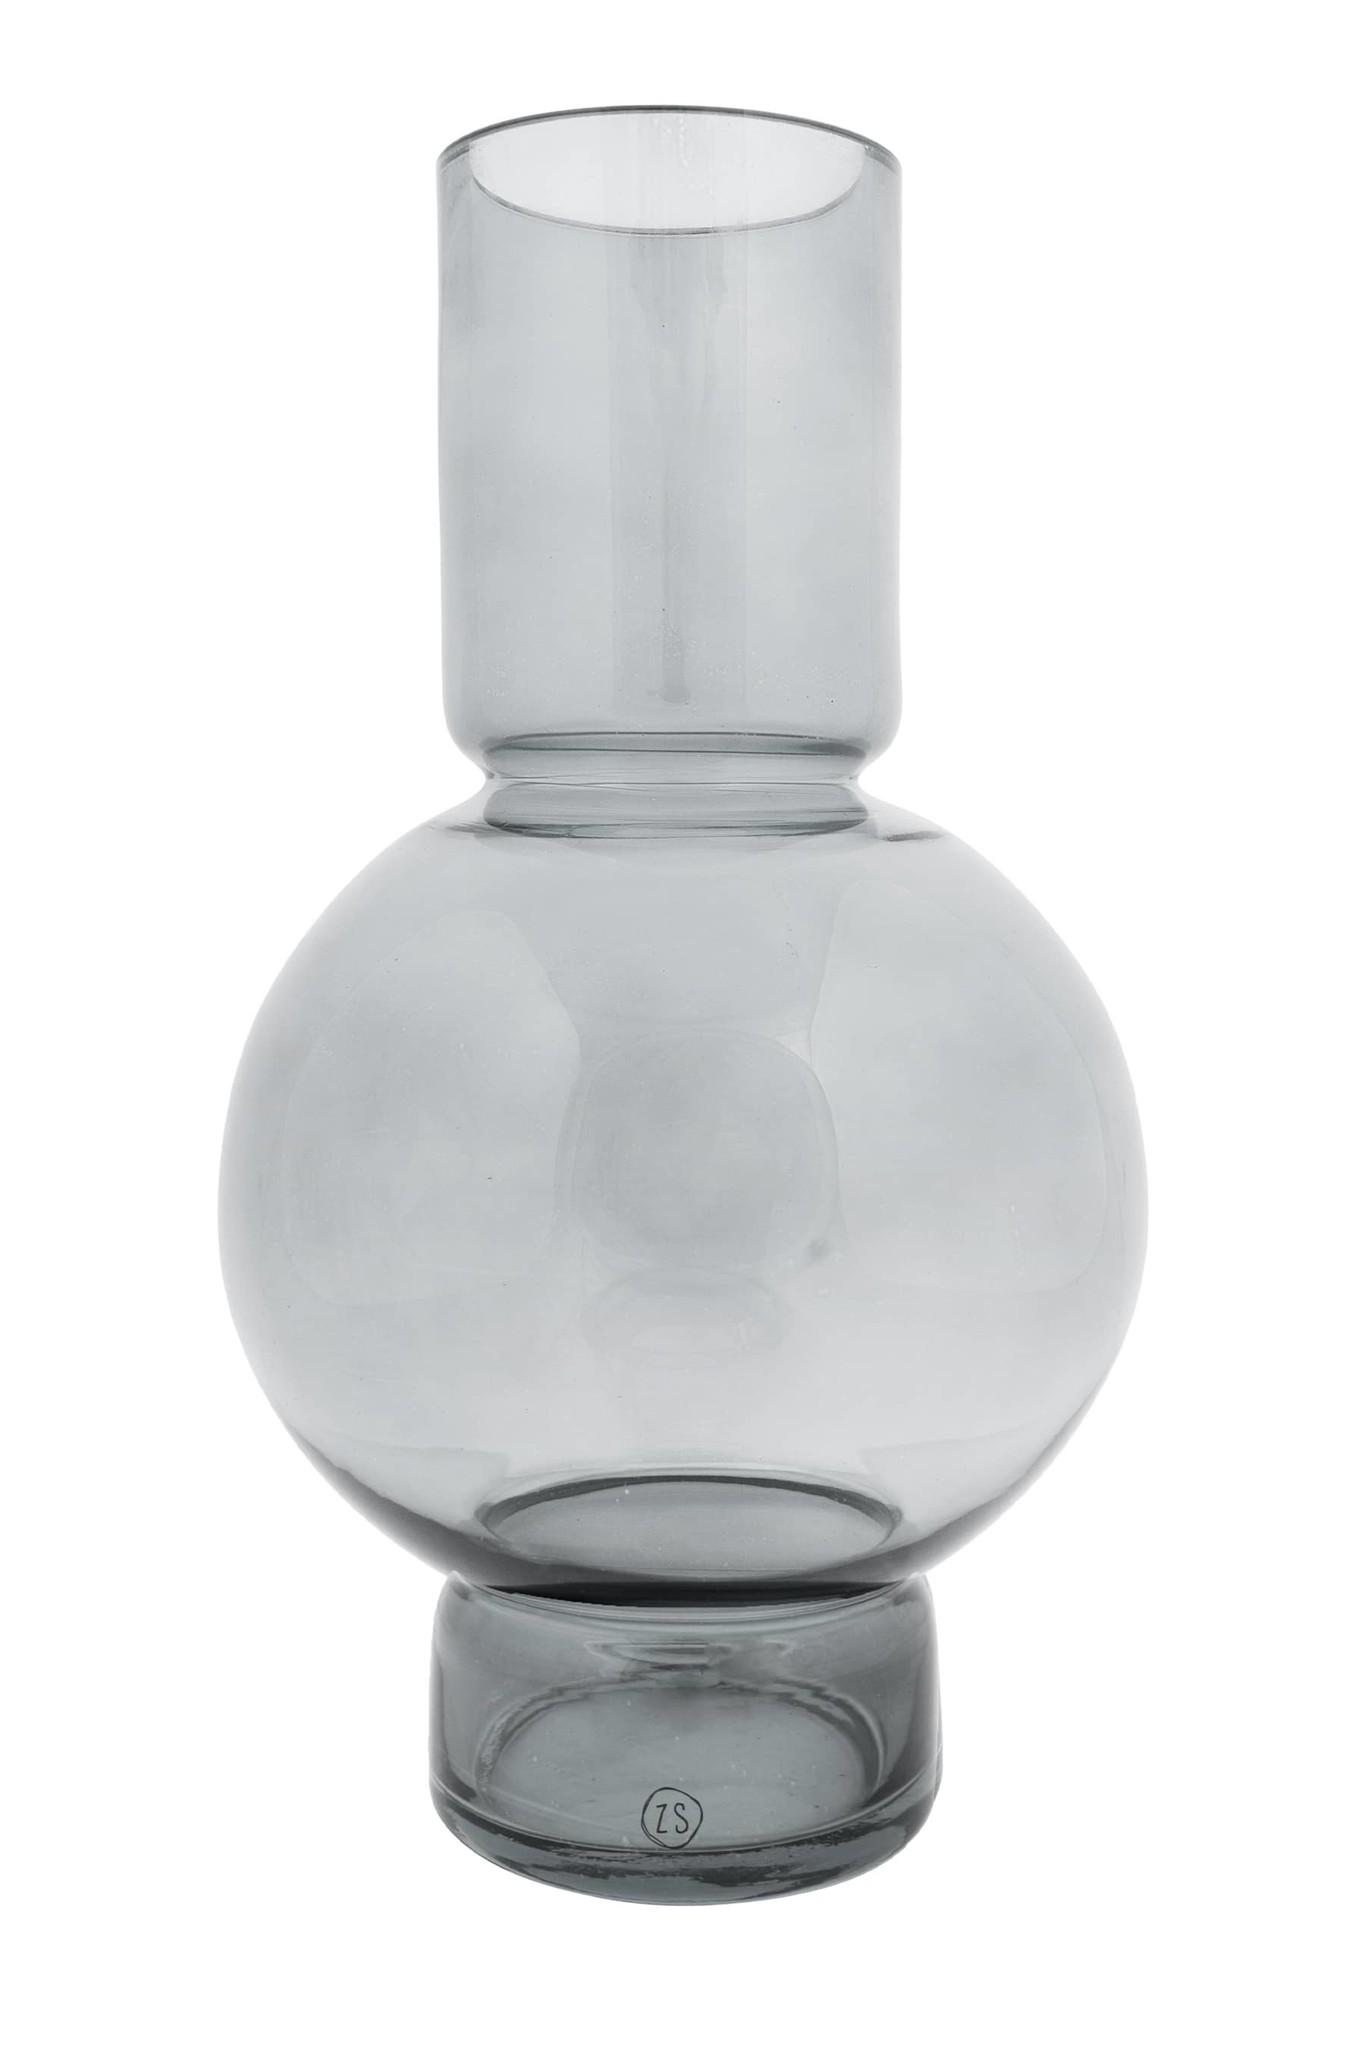 Zusss glazen bolvaas 17x30 - grafietgrijs